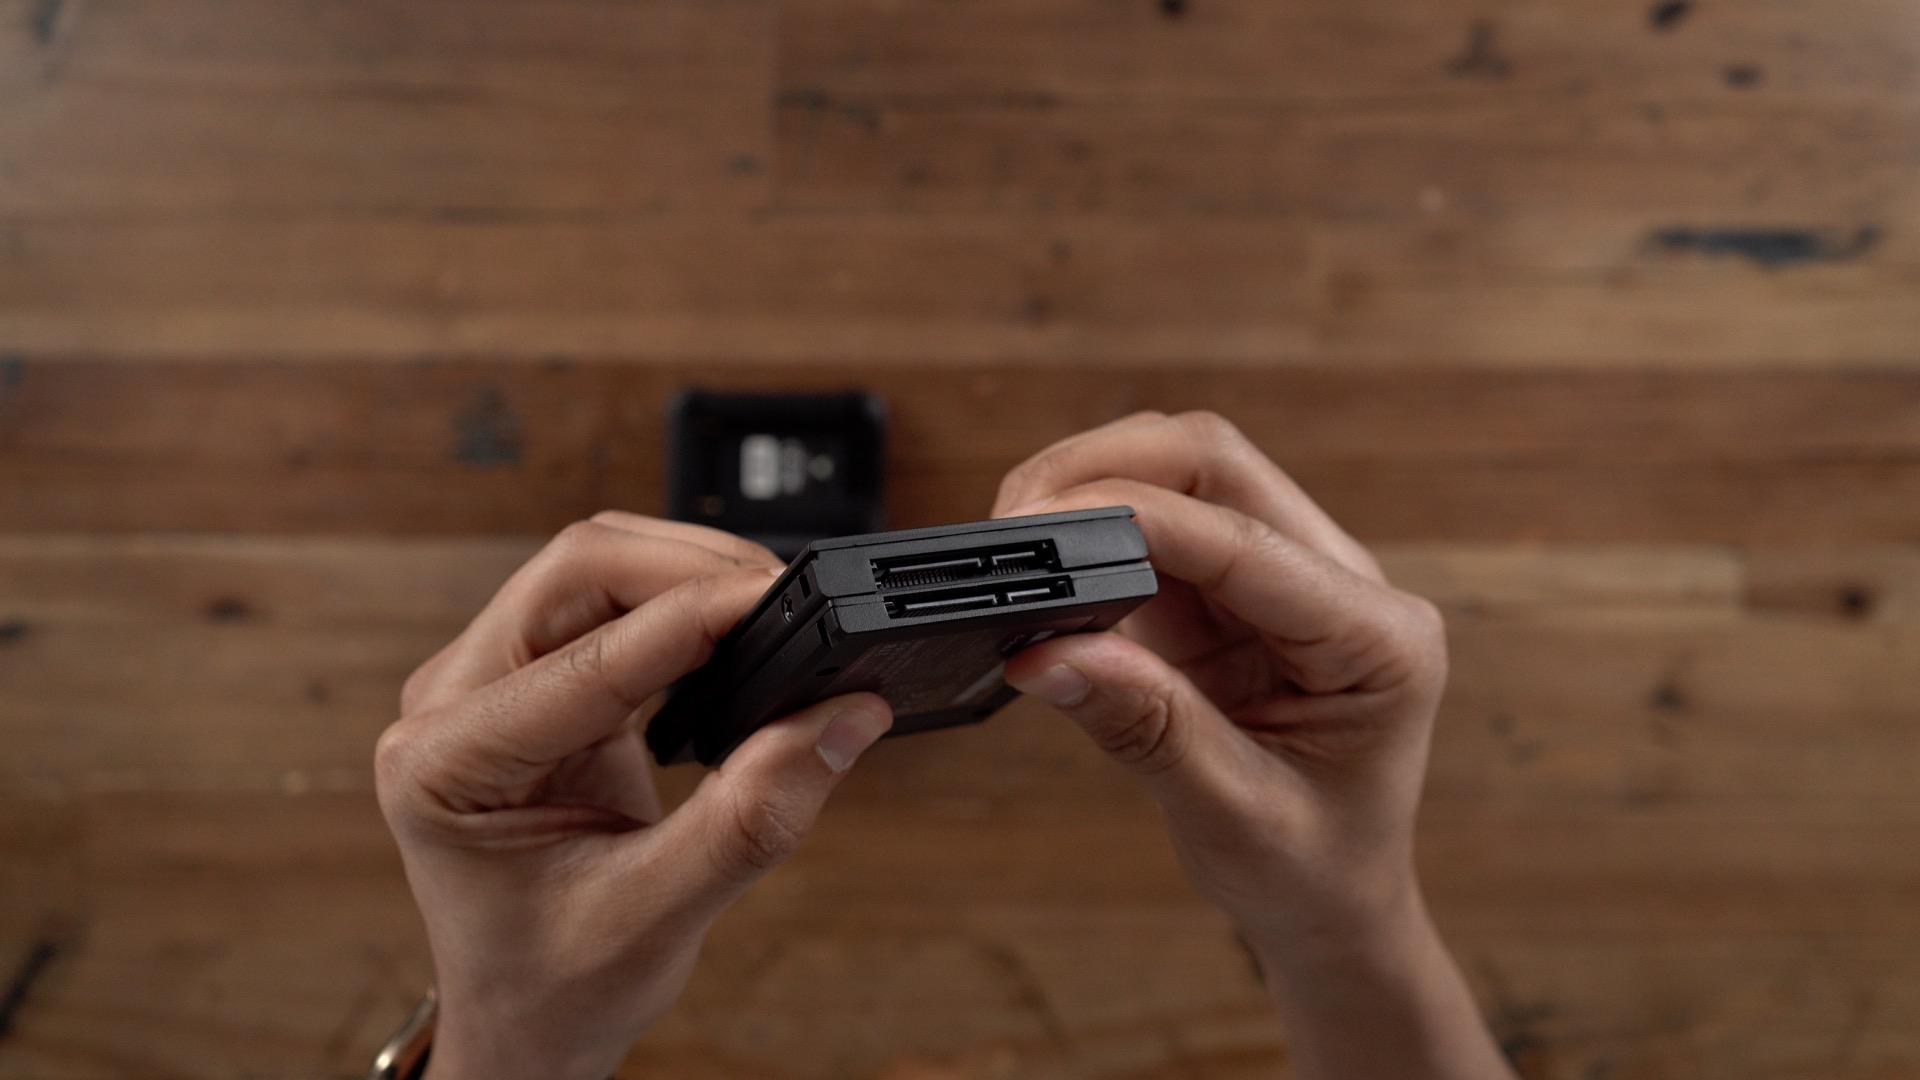 Atomos Ninja V Sony SSDmini SATA III